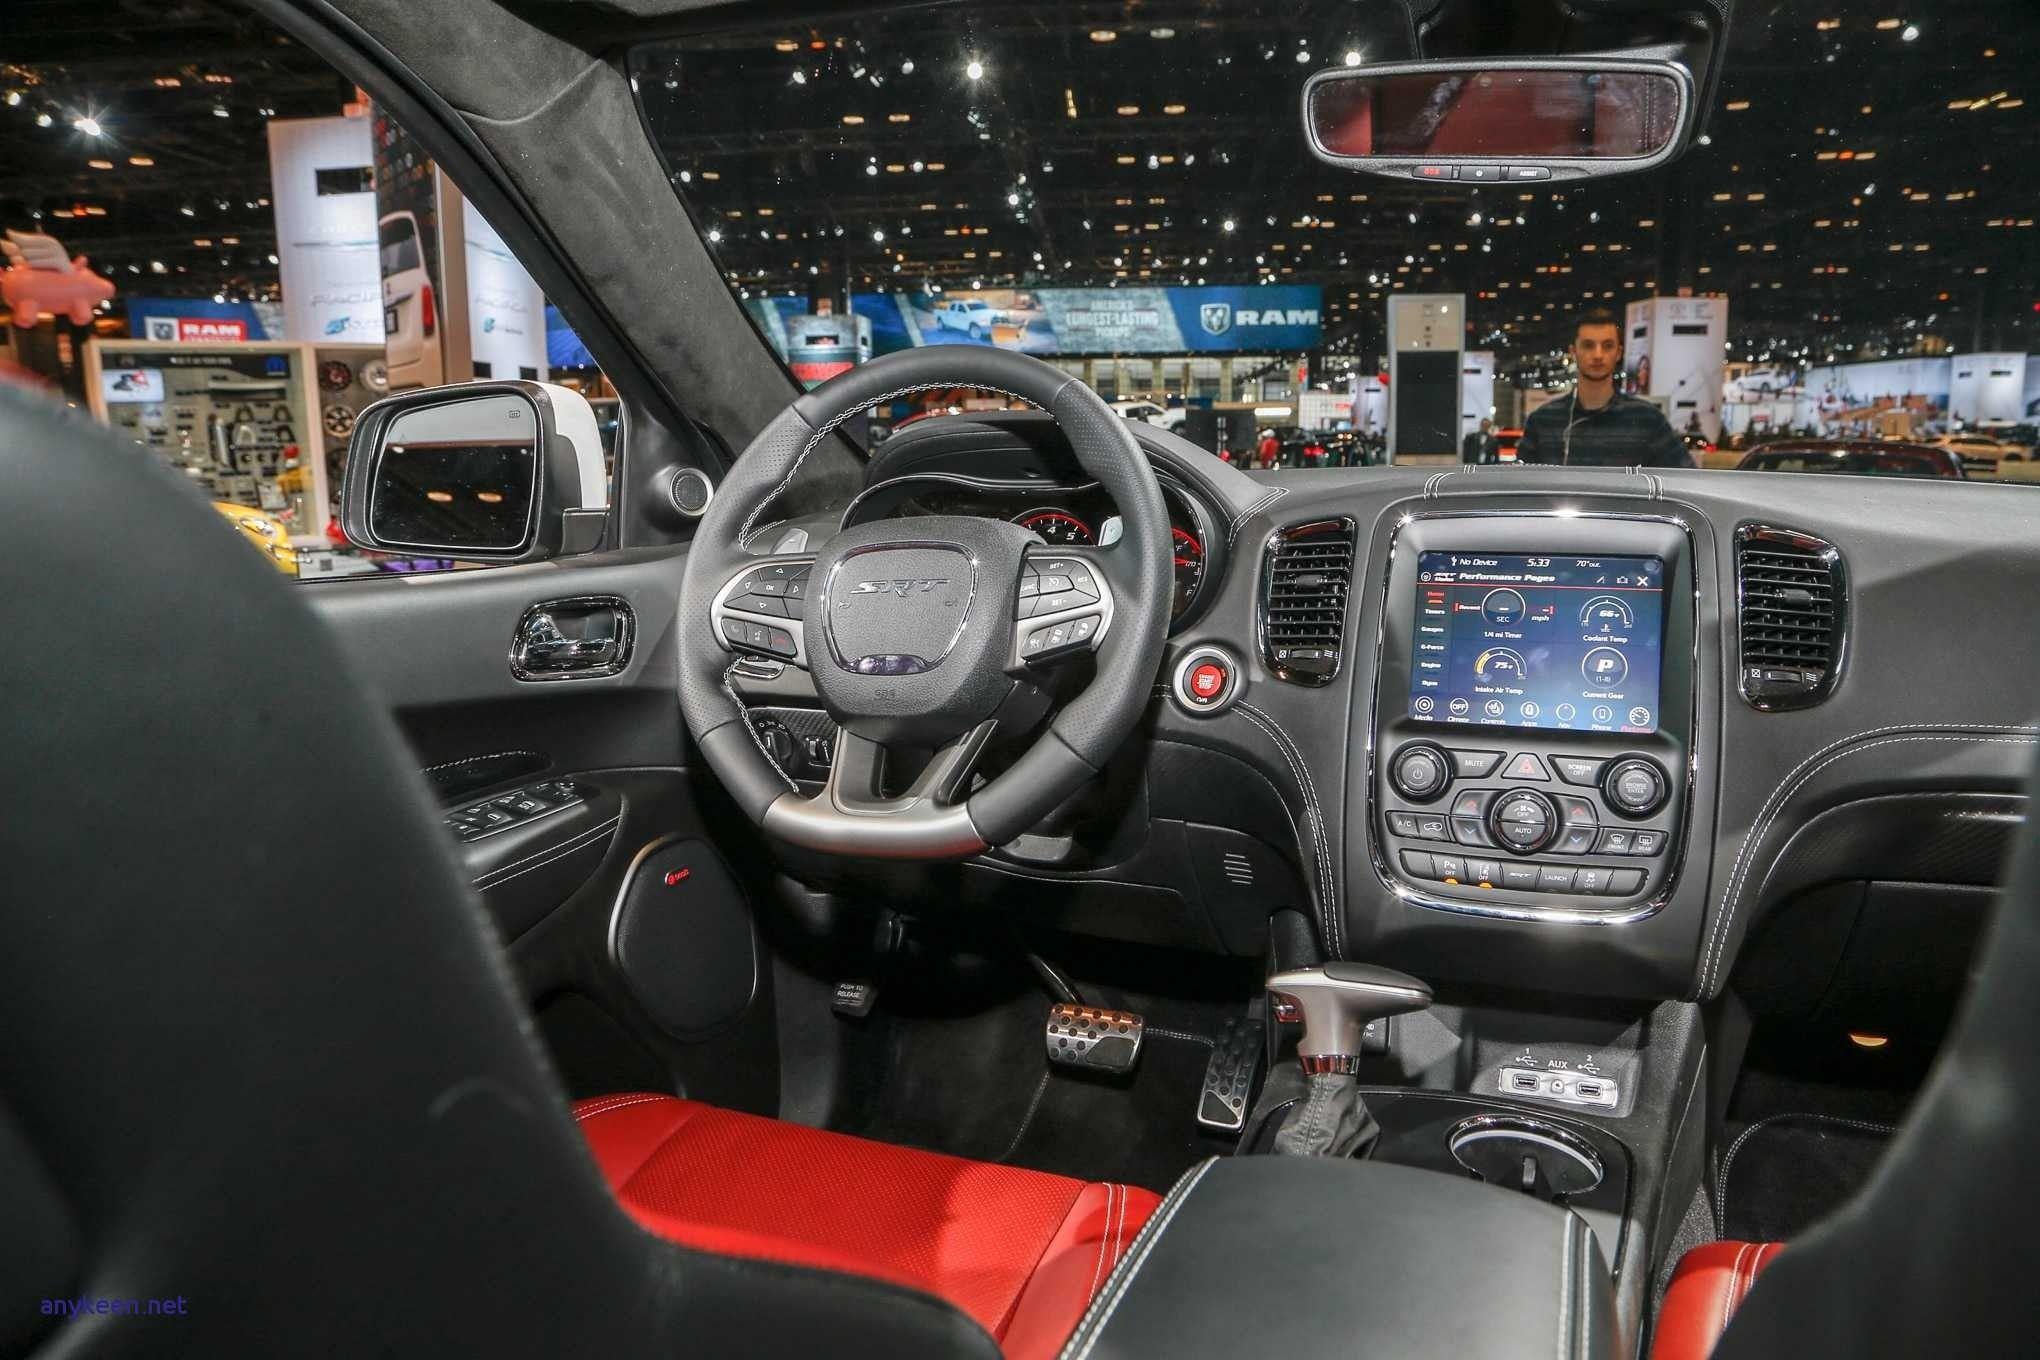 2019 Dodge Durango Limited Concept Dodge Durango Dodge Durango Interior Dodge